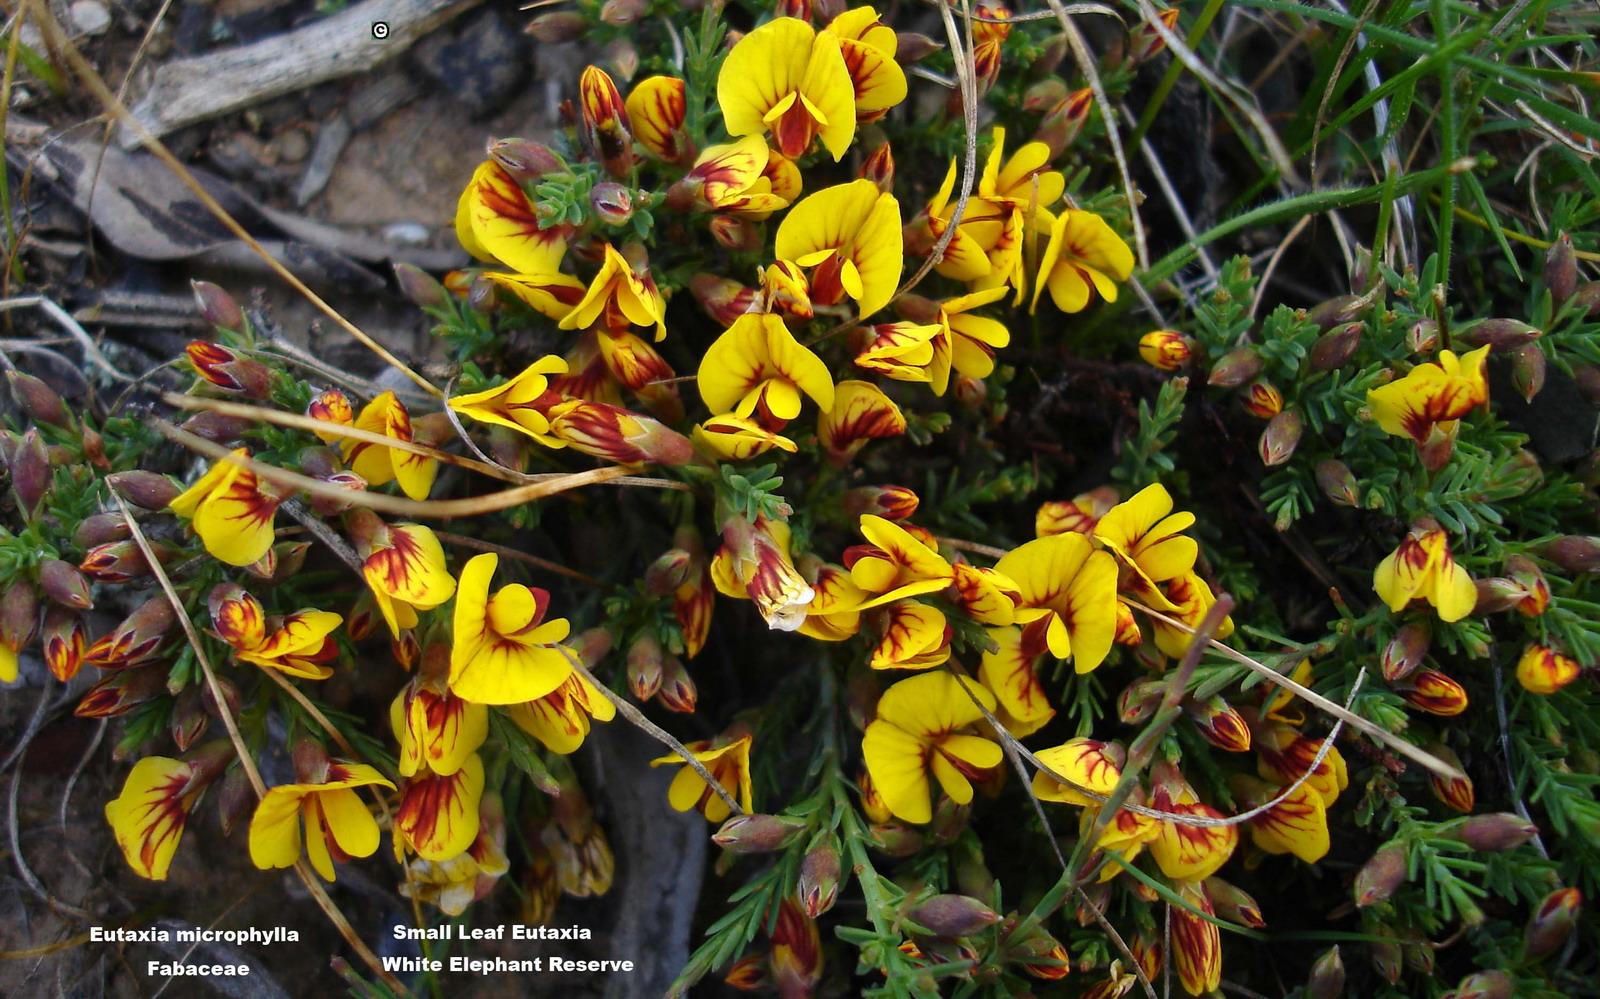 Eutaxia microphylla flora ALA source